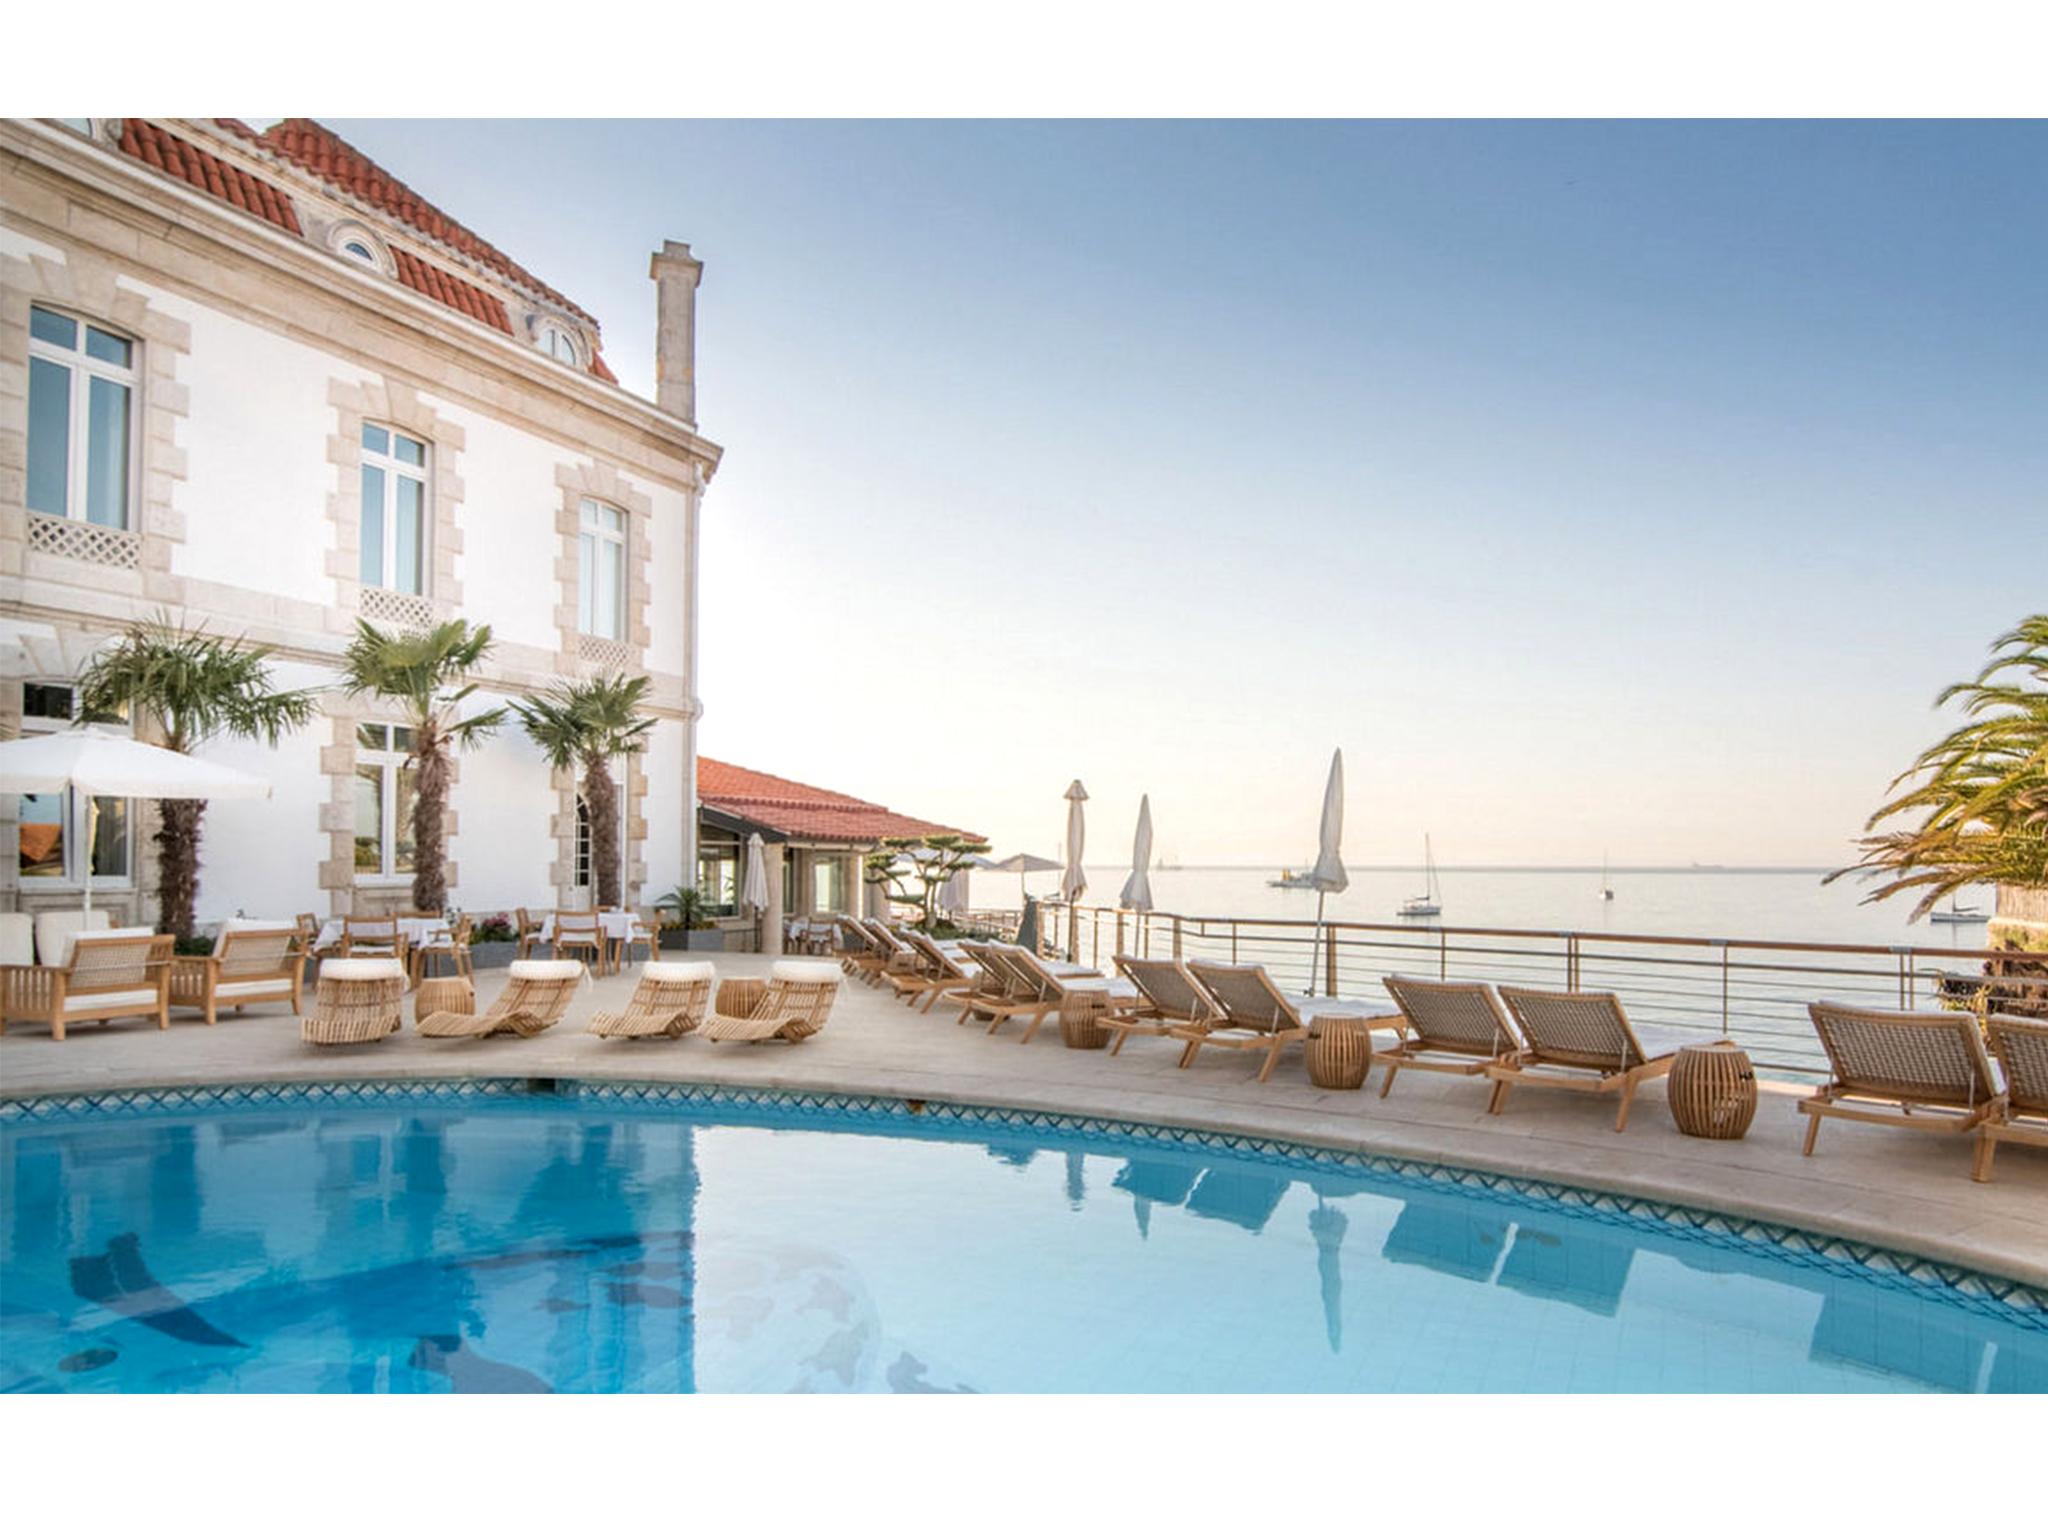 Hotel, The Albatroz Hotel, Piscina